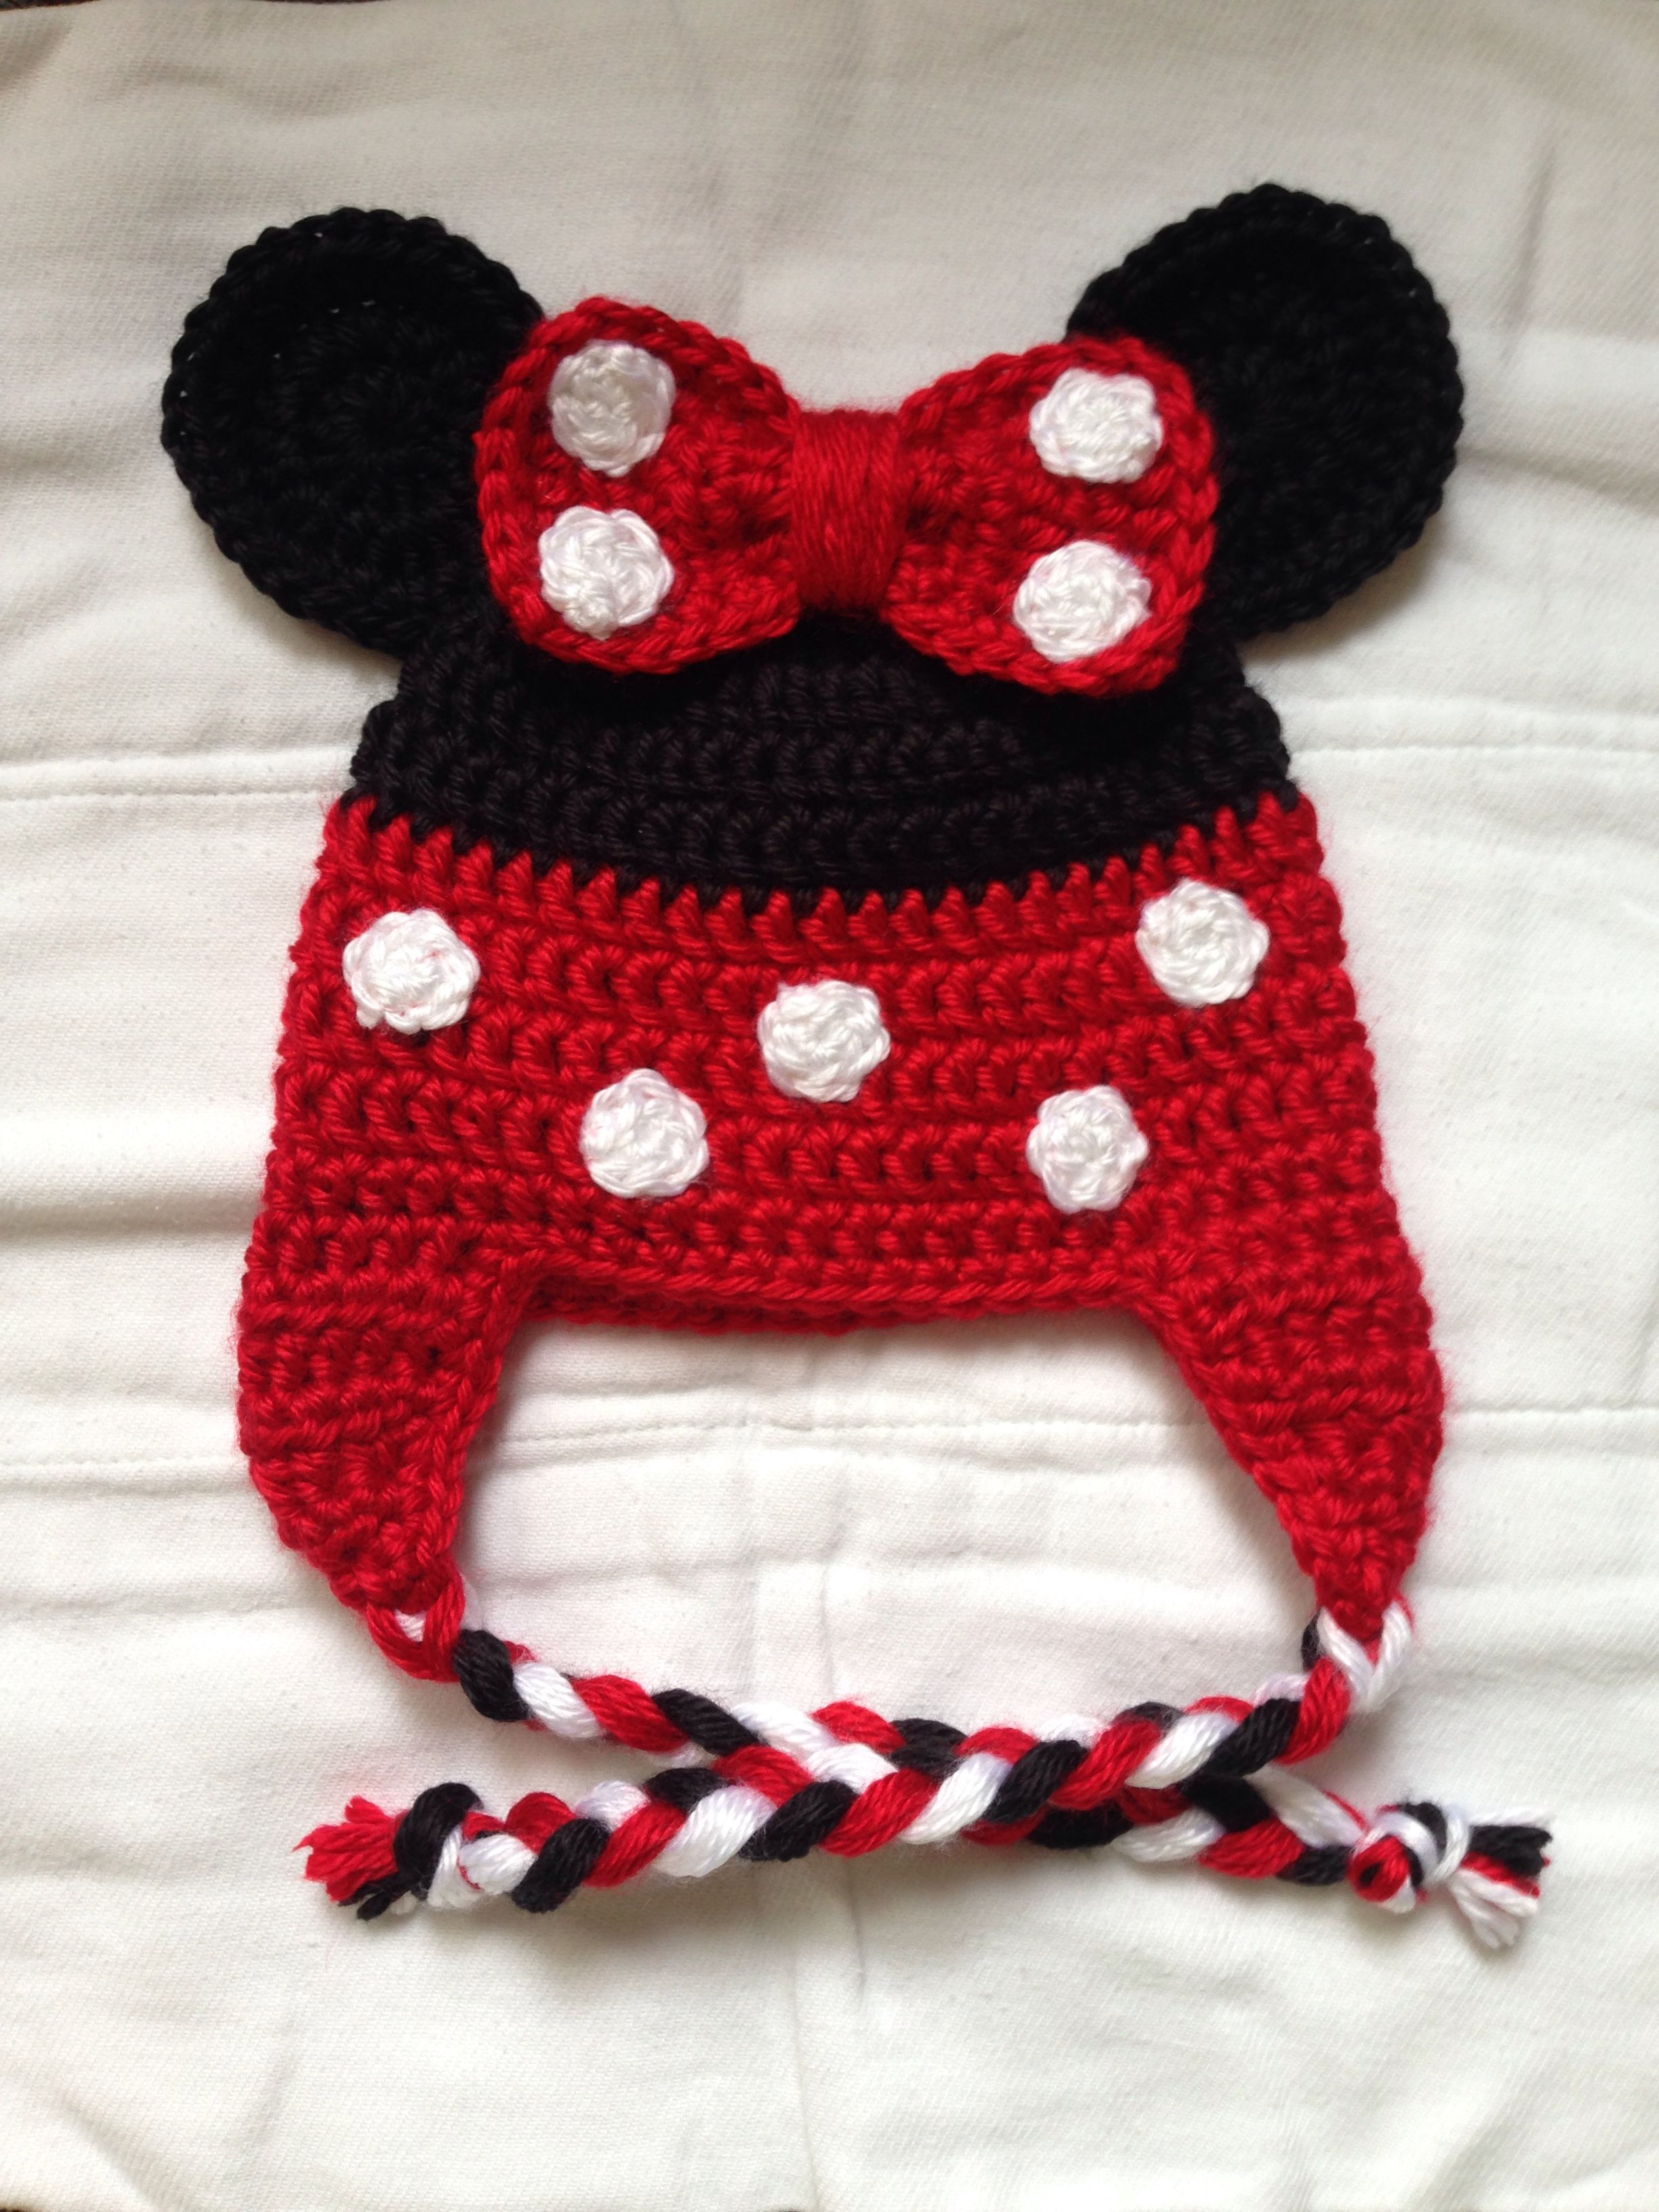 Minnie Mouse crochet hat | My crochet projects | Pinterest